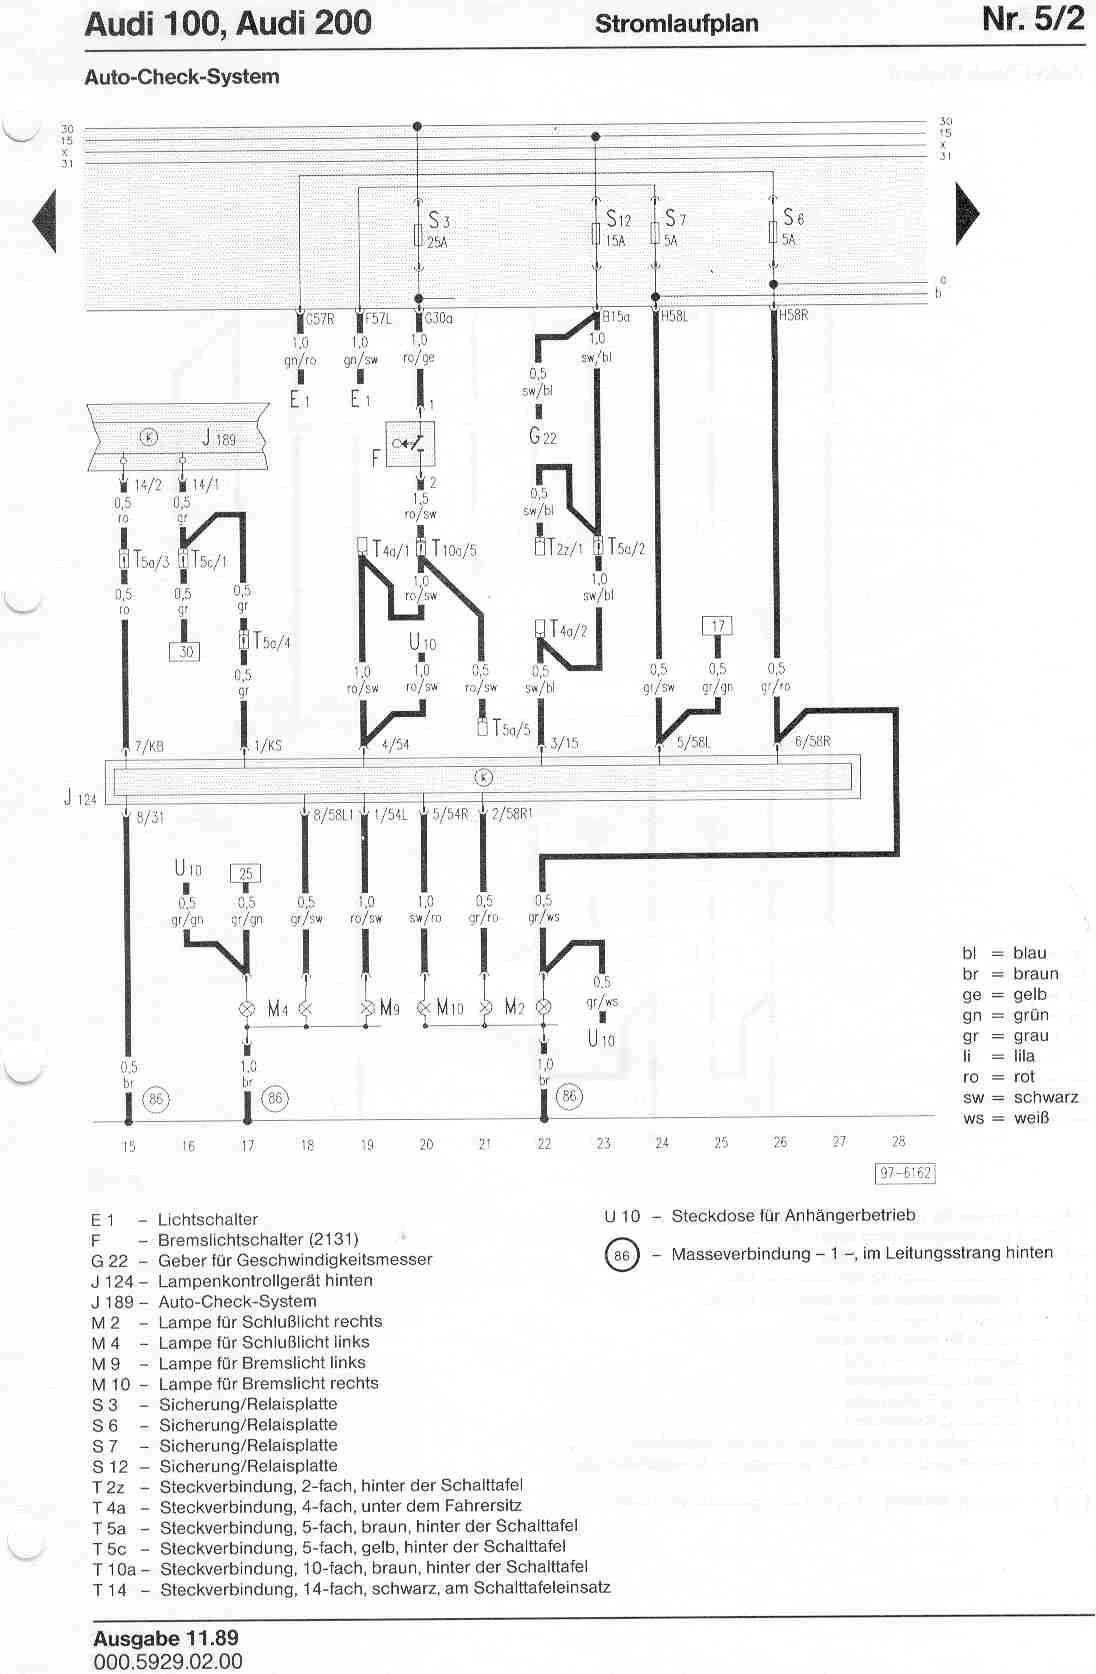 audi 100 c4 wiring diagram volvo penta 200 factory diagrams